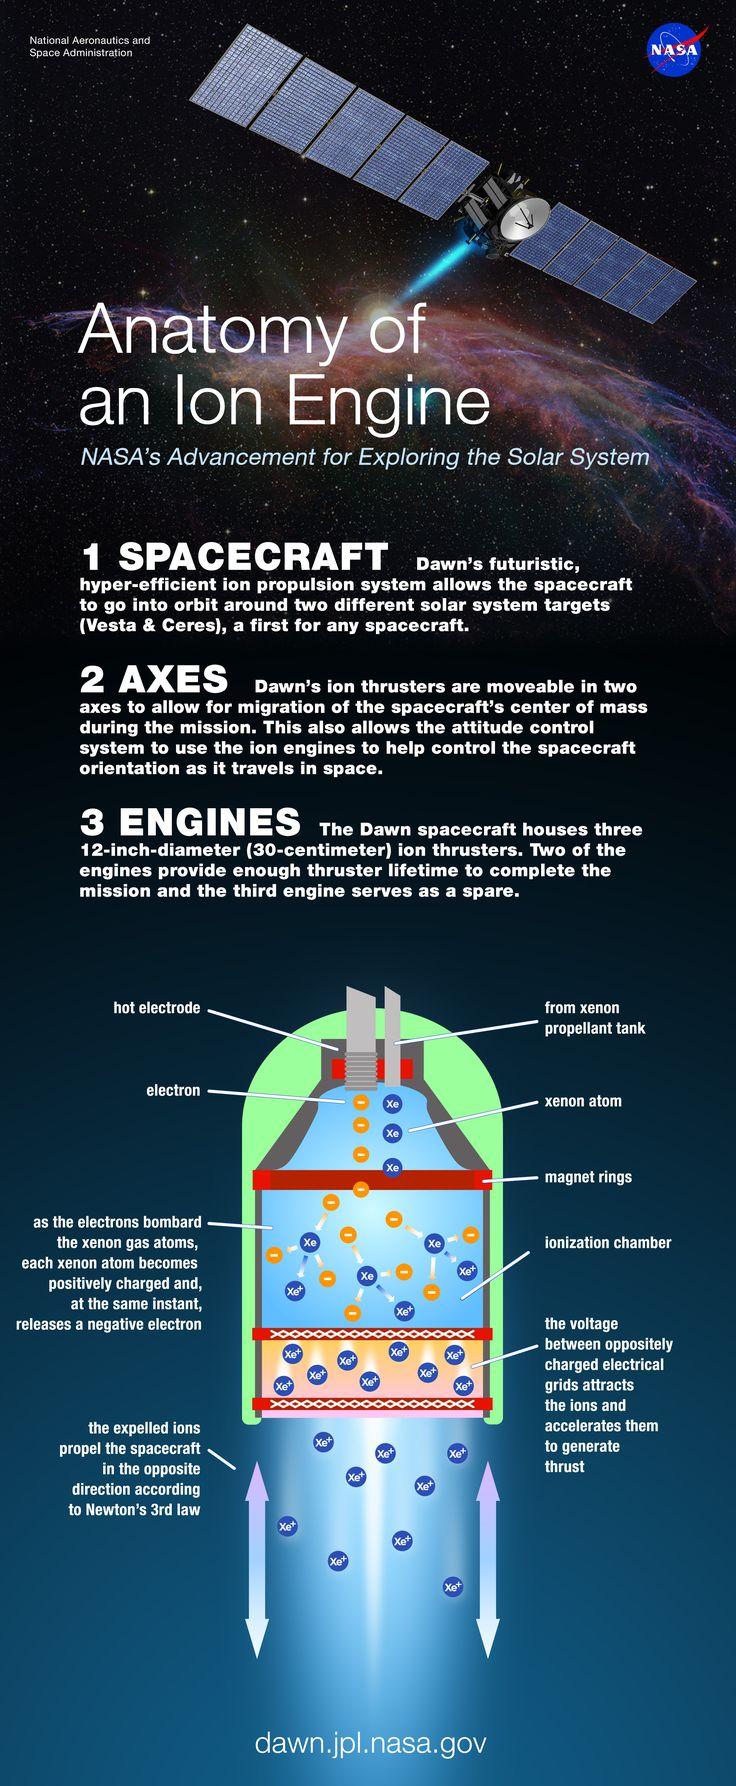 Anatomy of an Ion Engine